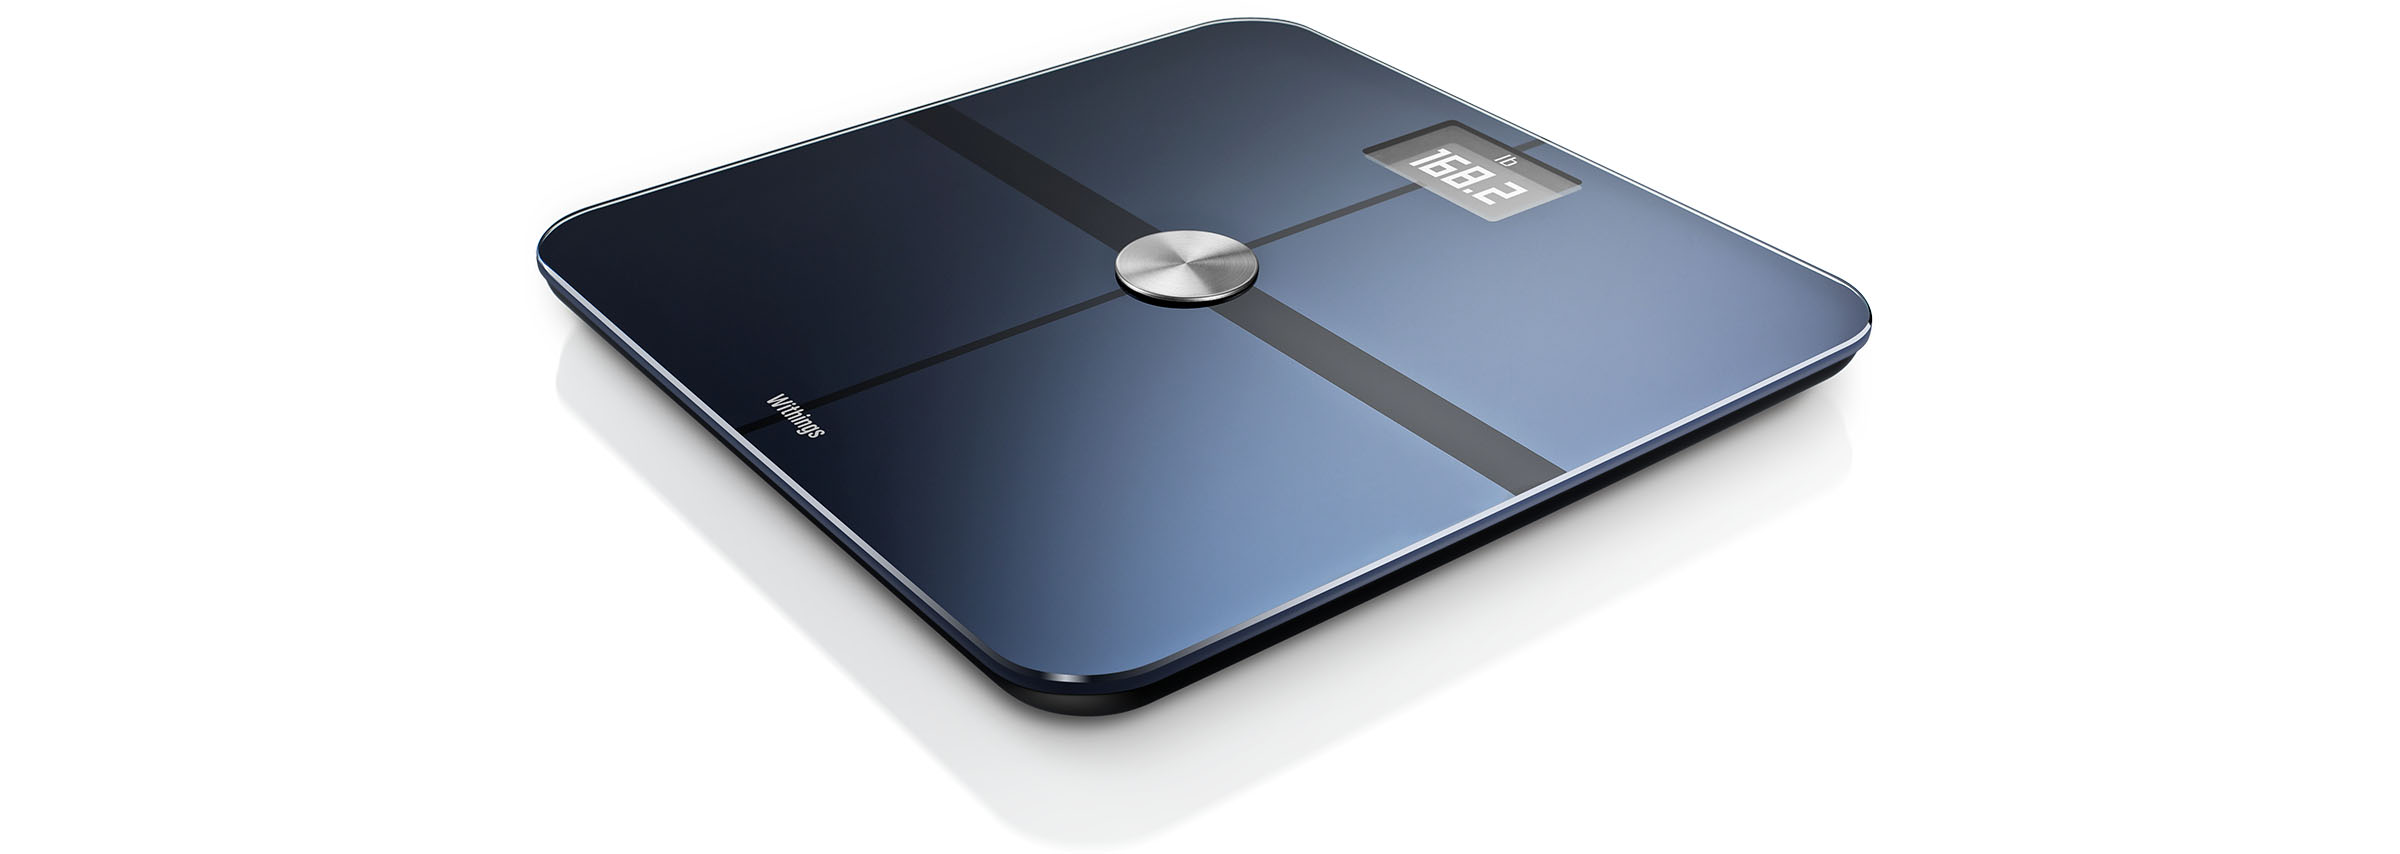 gudrie svari: Withings WS-50 – Smart body analyzer